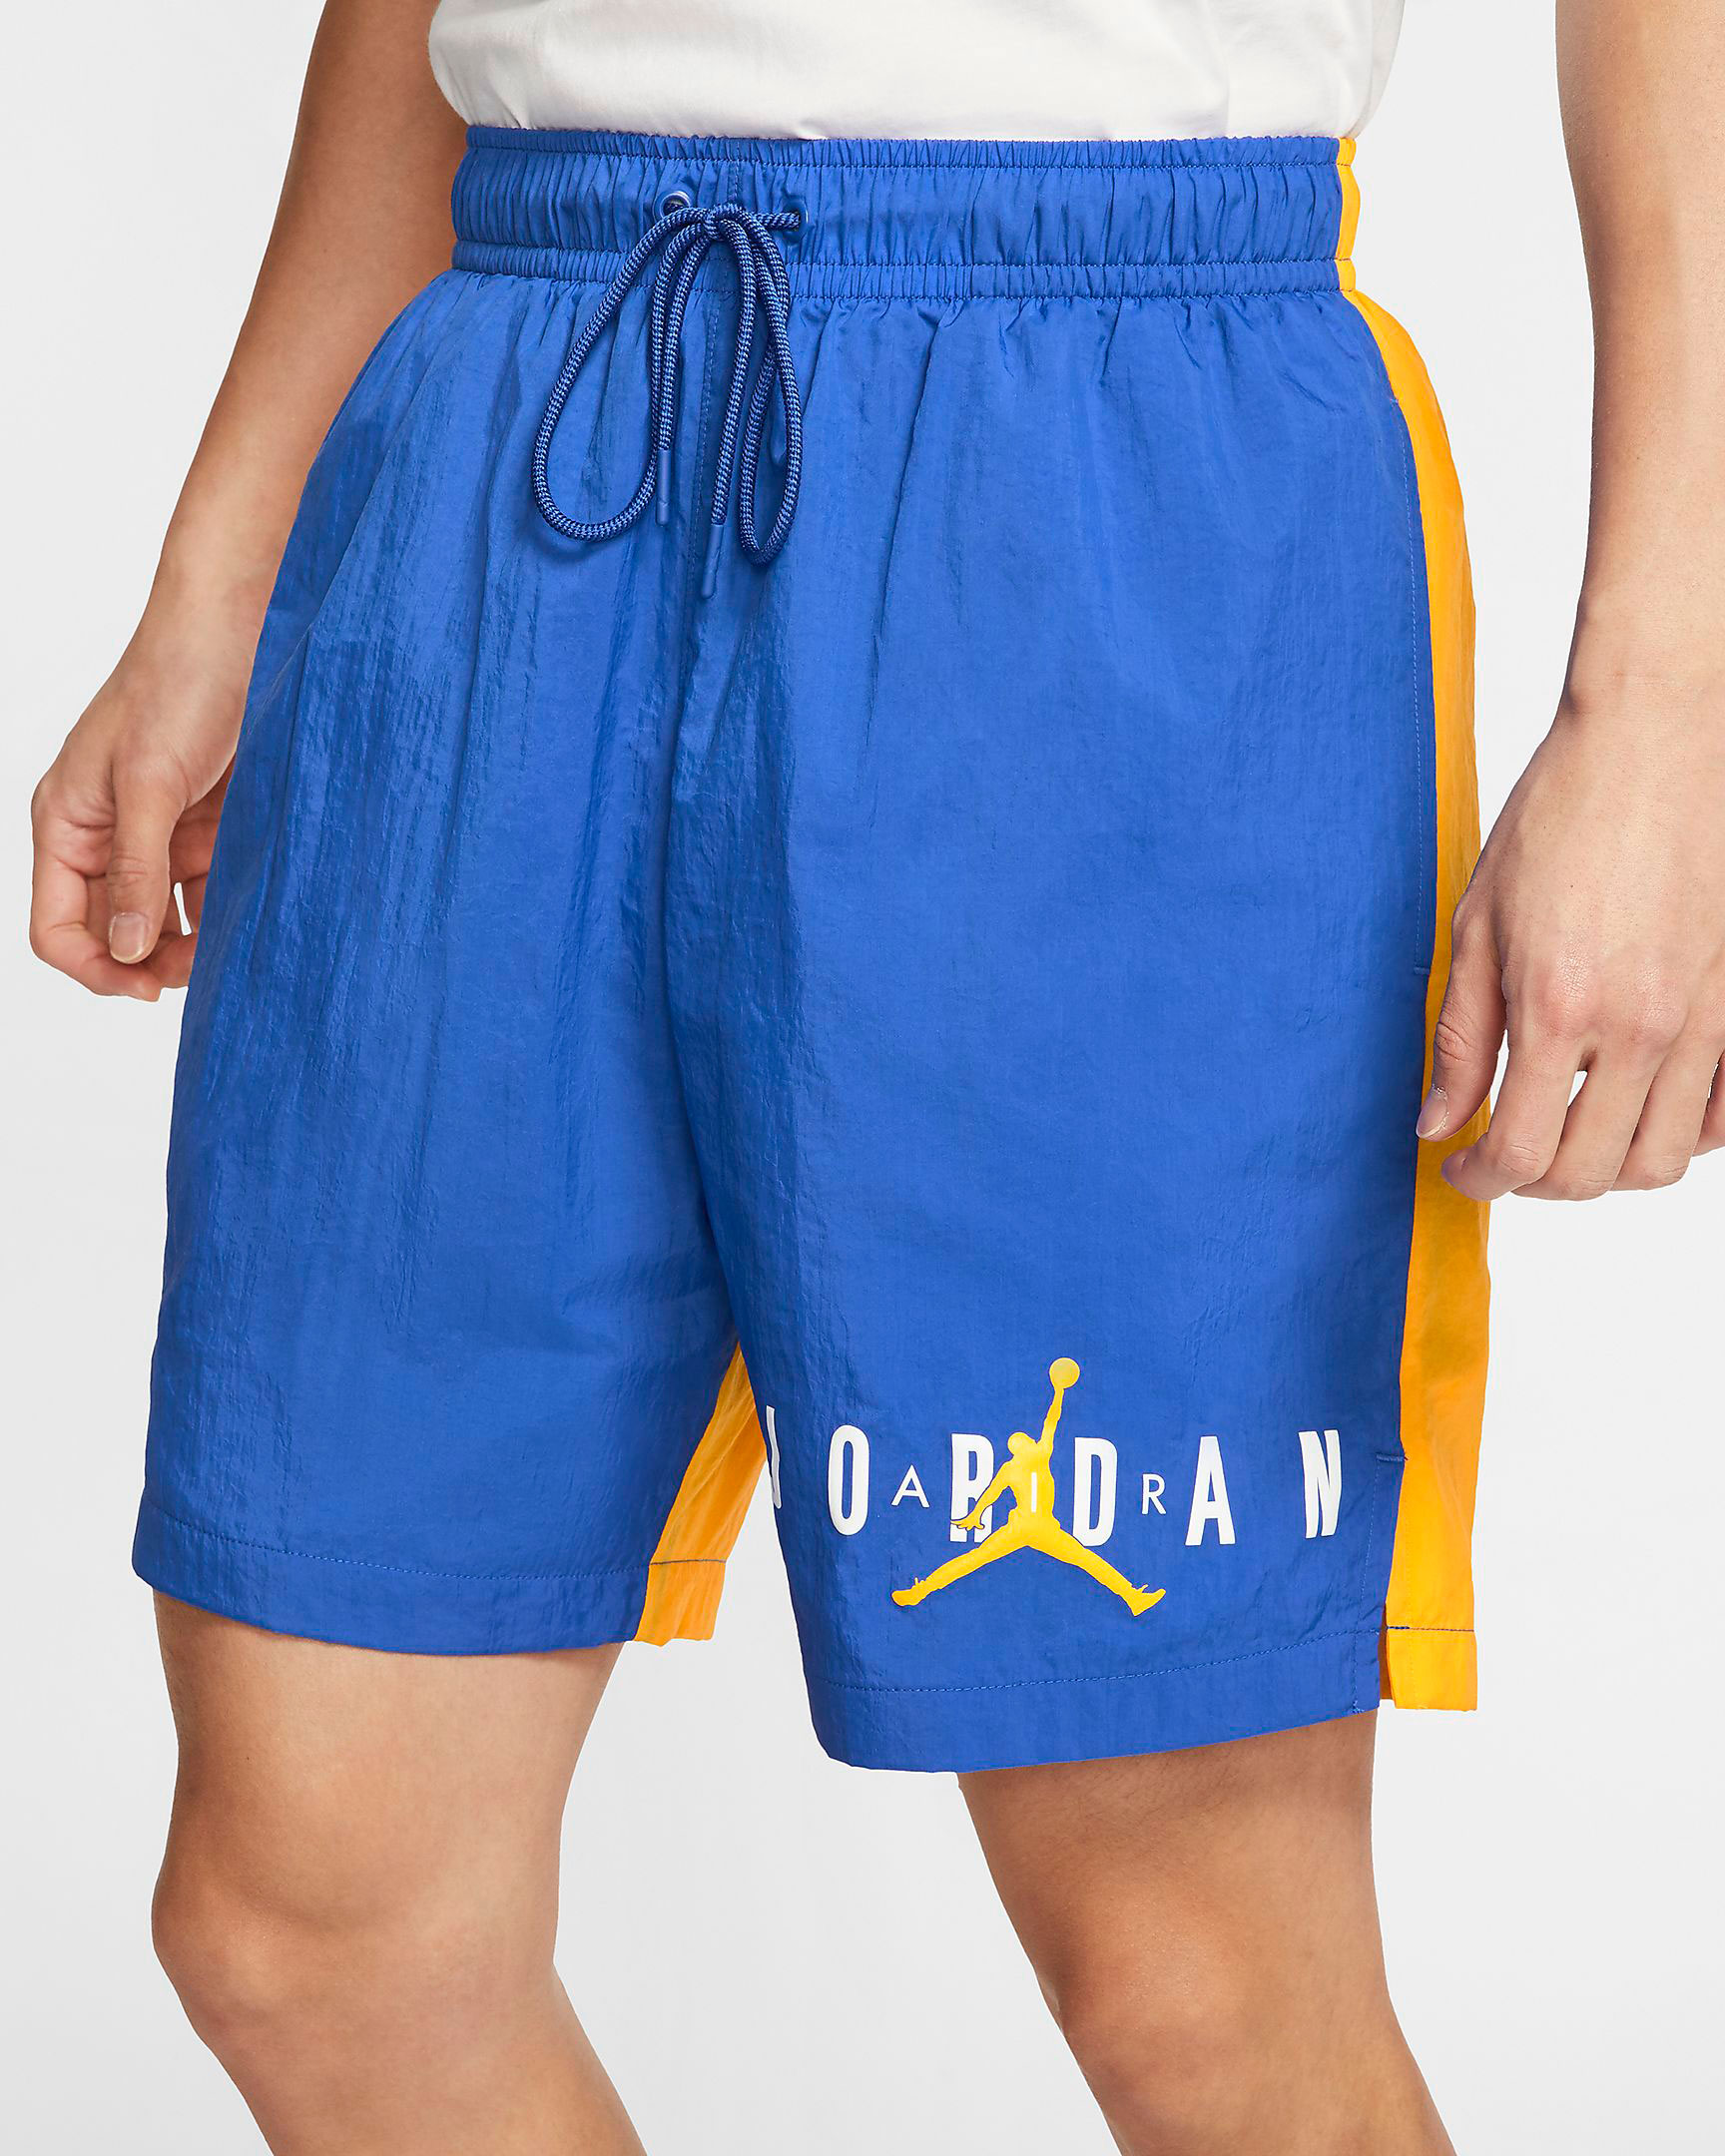 jordan-1-game-royal-toe-shorts